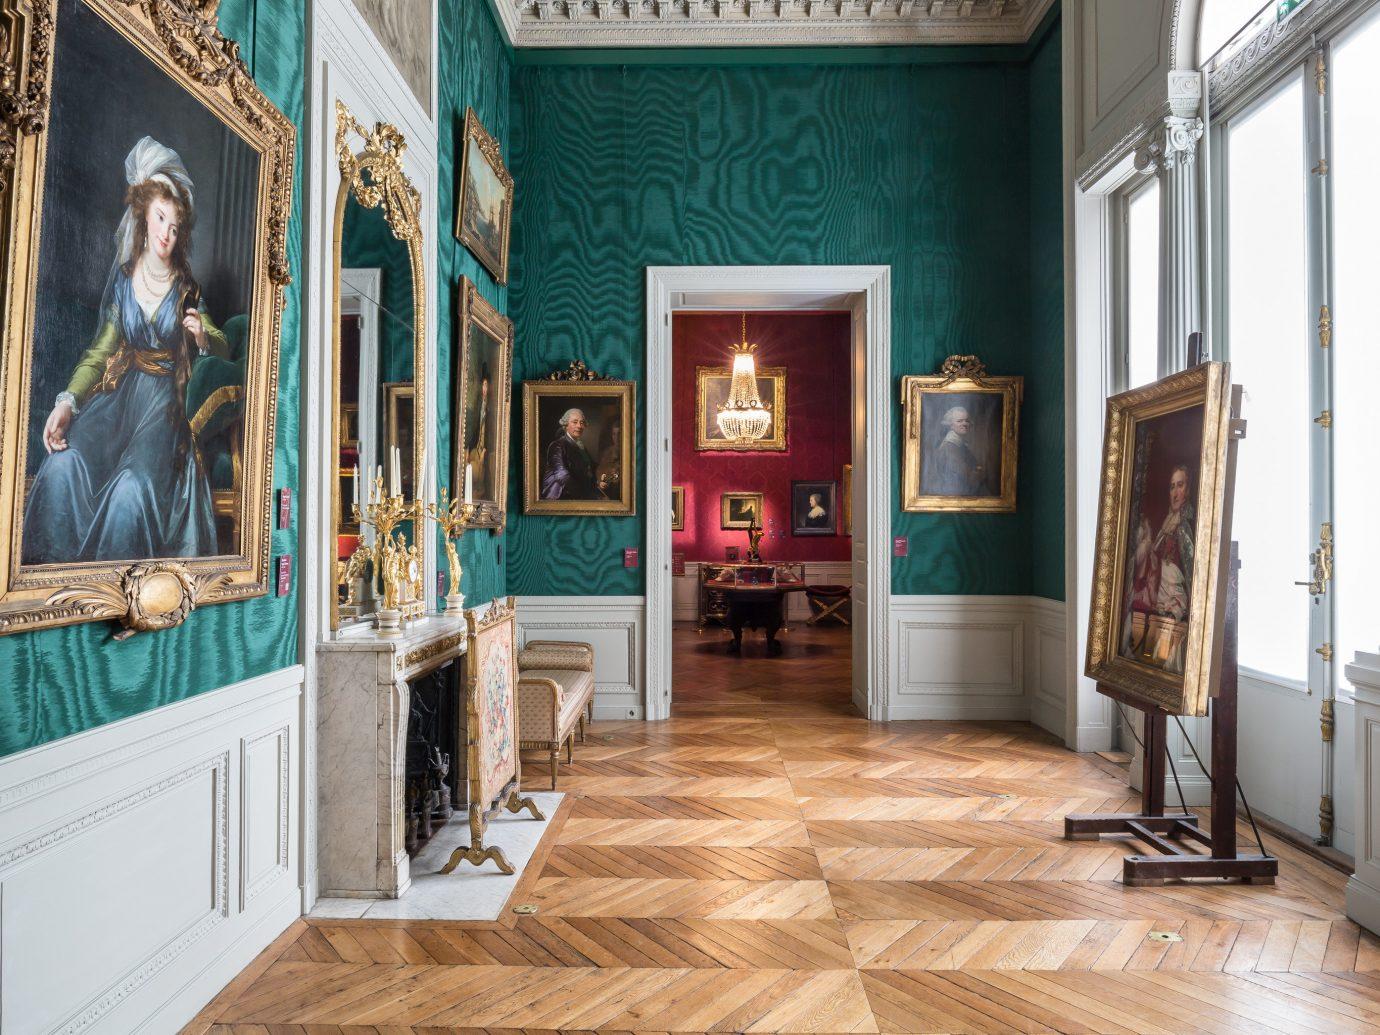 Interior of Musée Jacquemart-André in Paris